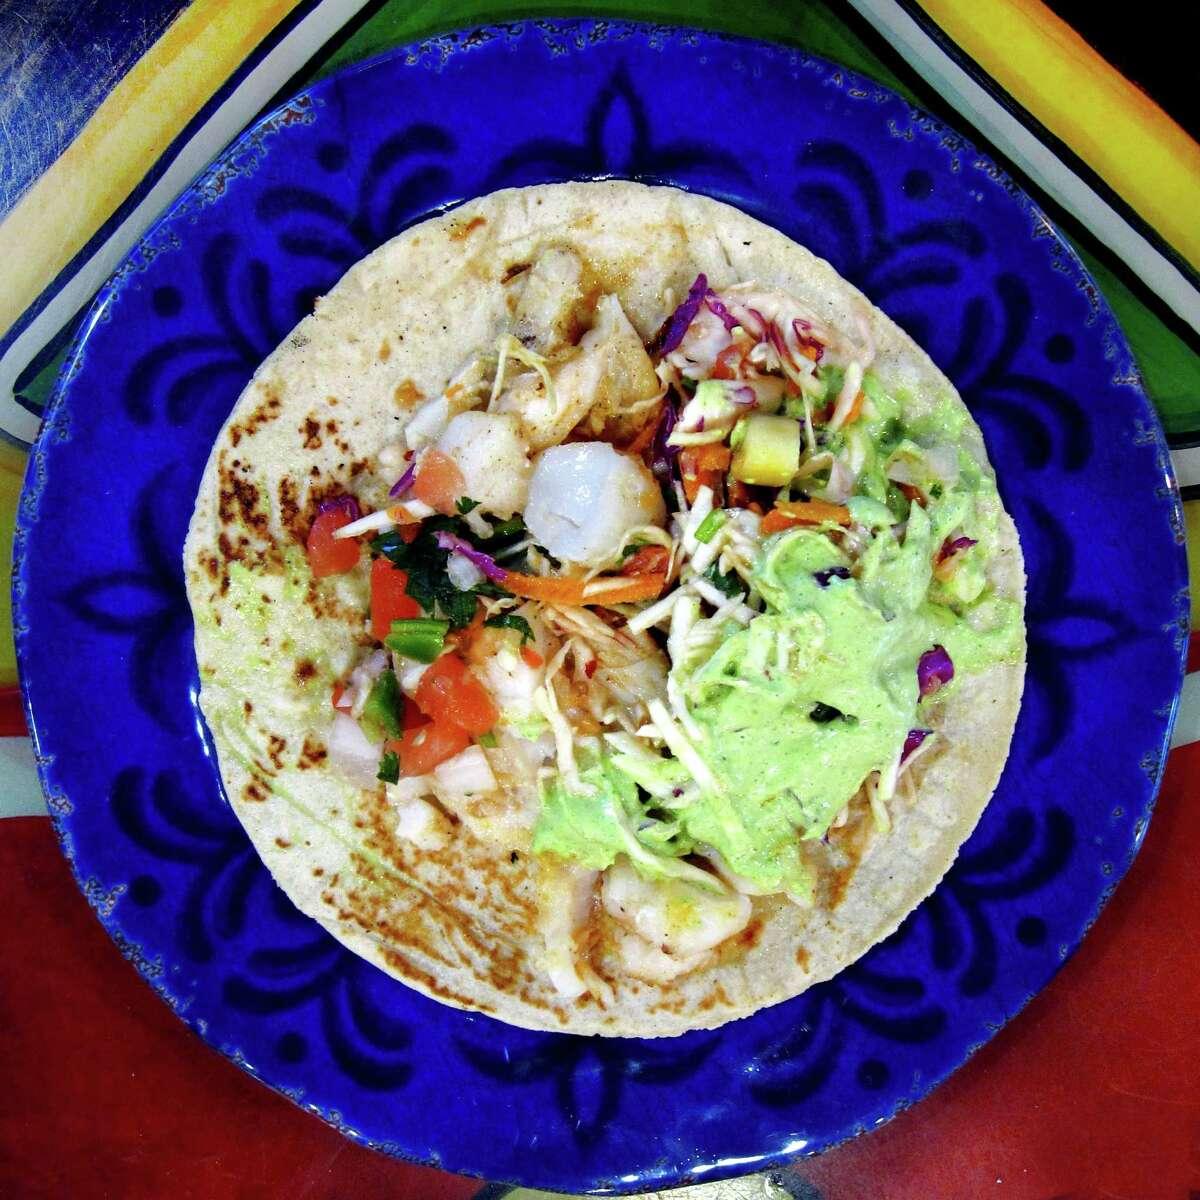 Fish taco on a handmade corn tortilla from Nicha's Comida Mexicana on Roosevelt Avenue.